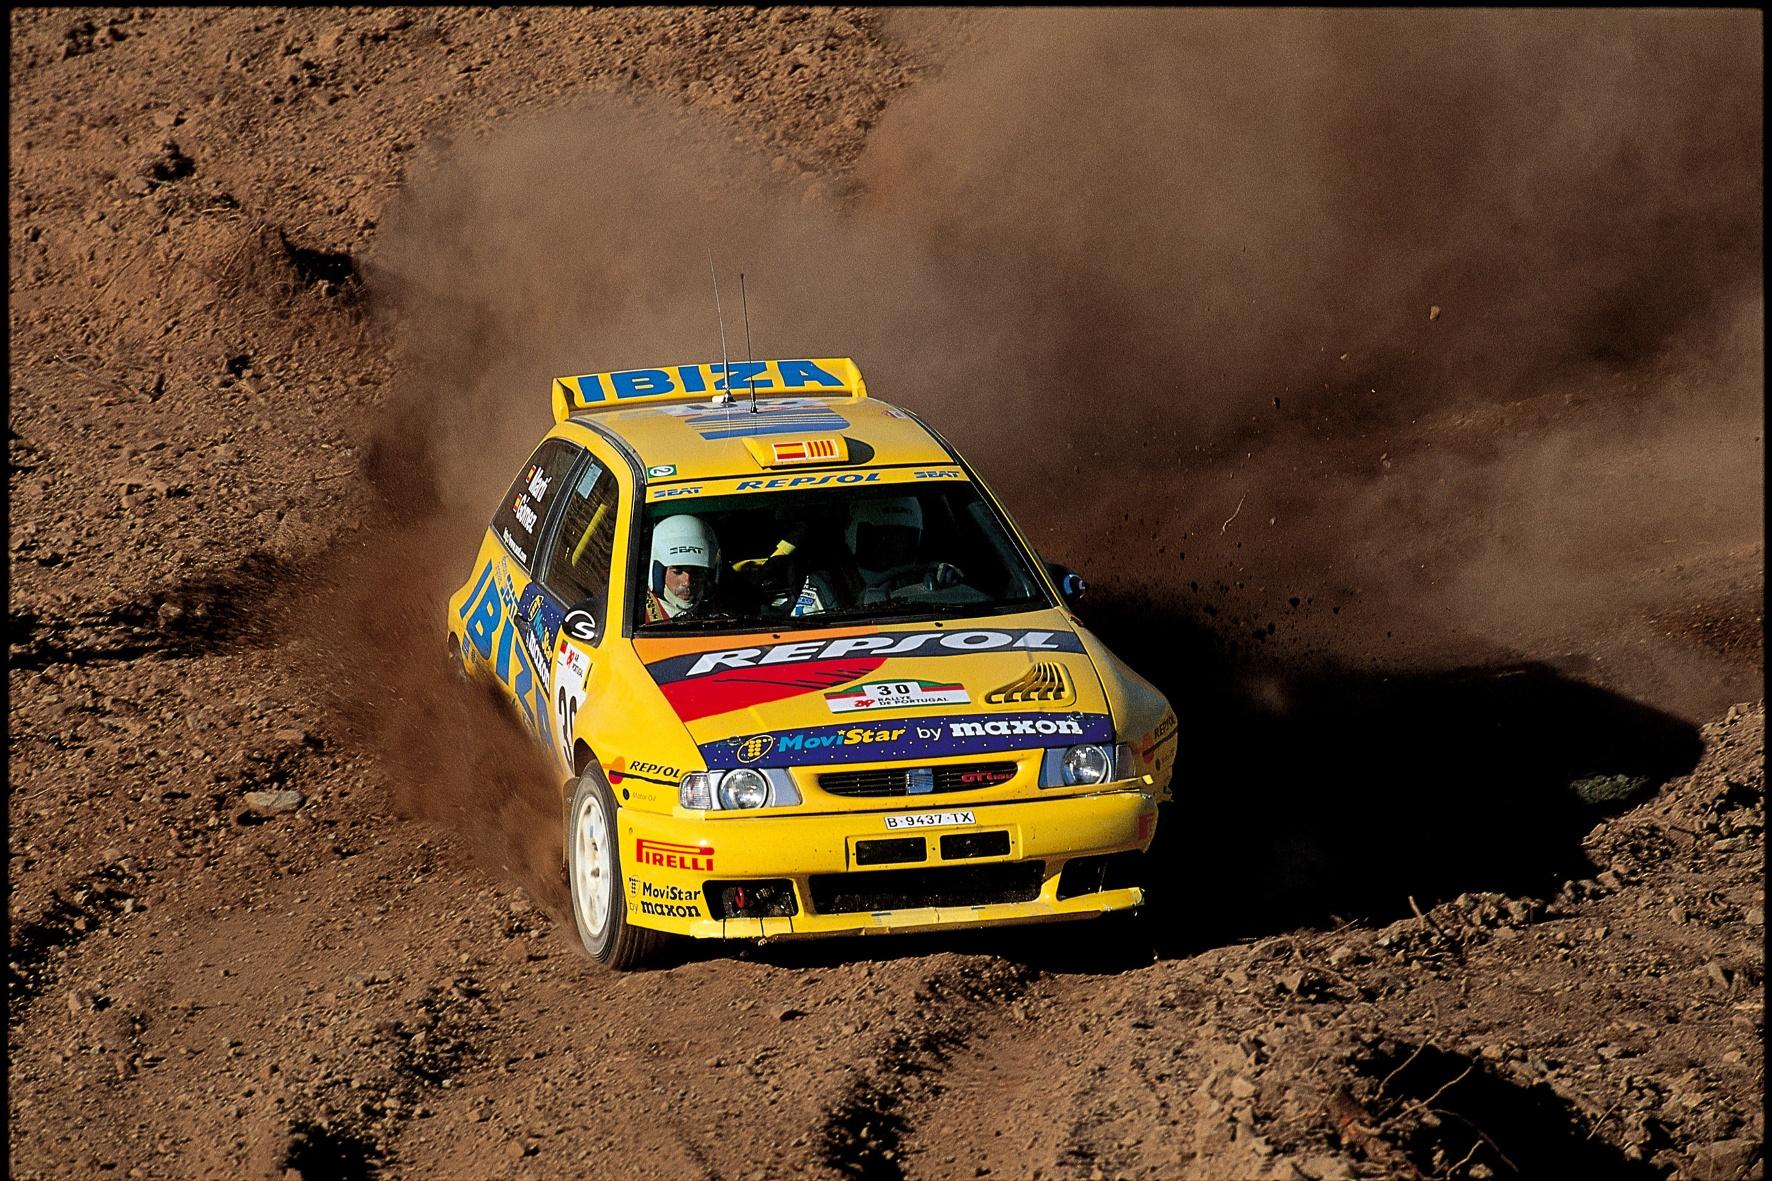 Rallye-Oldie-Treffen in der Eifel